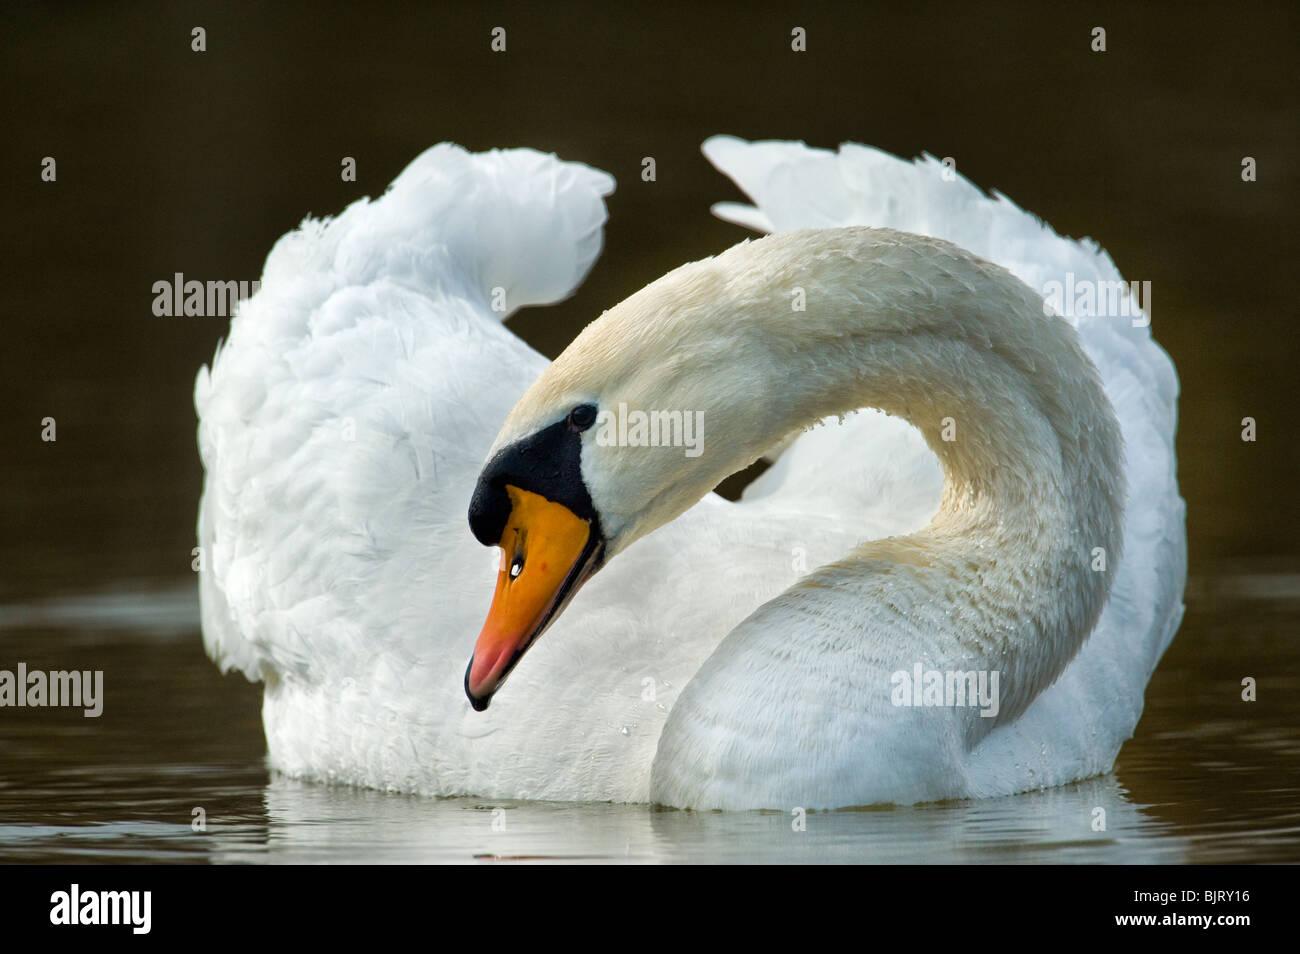 wild swan portrait with a 600 mm tele telelense lense white animal bird water  gliding glide swimm swimming grandious - Stock Image